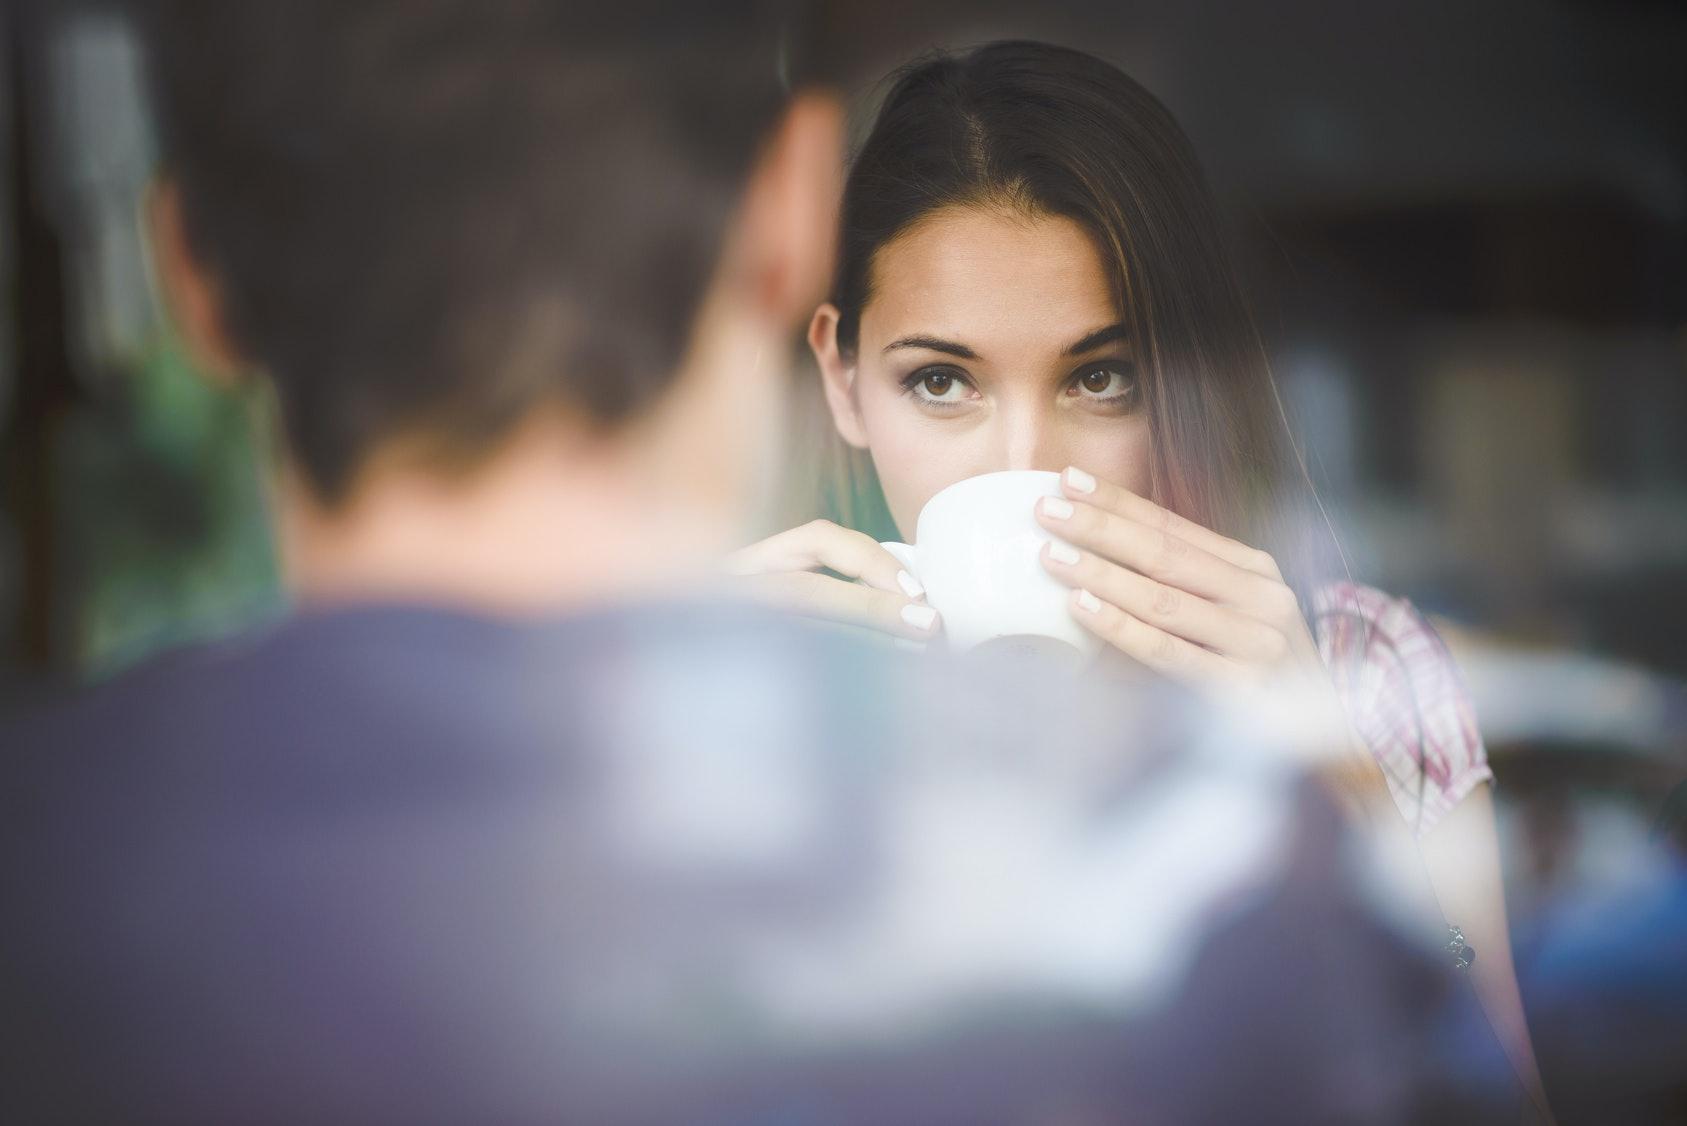 Serial monogamist dating